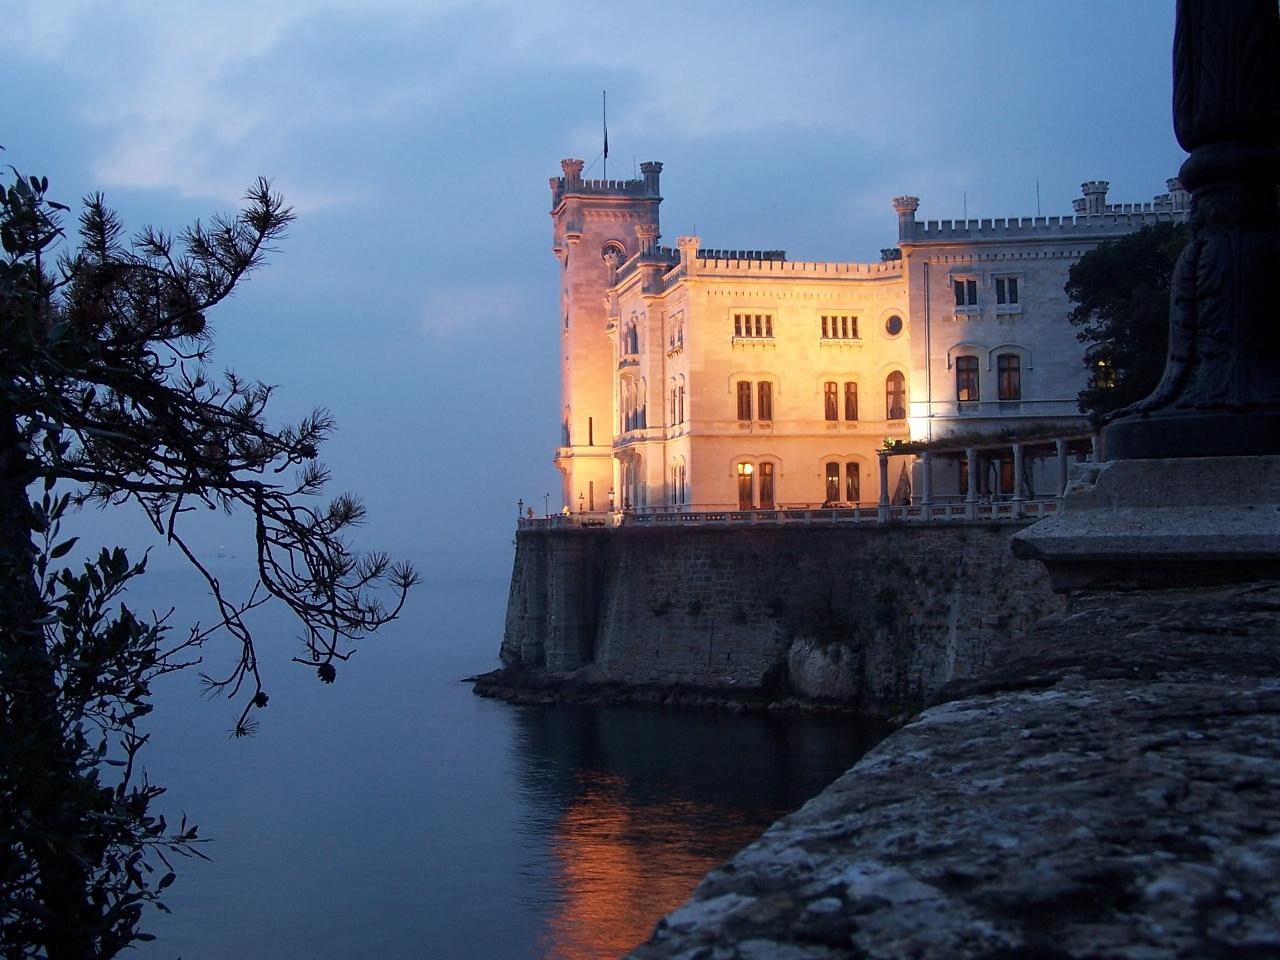 Trieste Castle Wedding a Day Visiting Trieste Castle